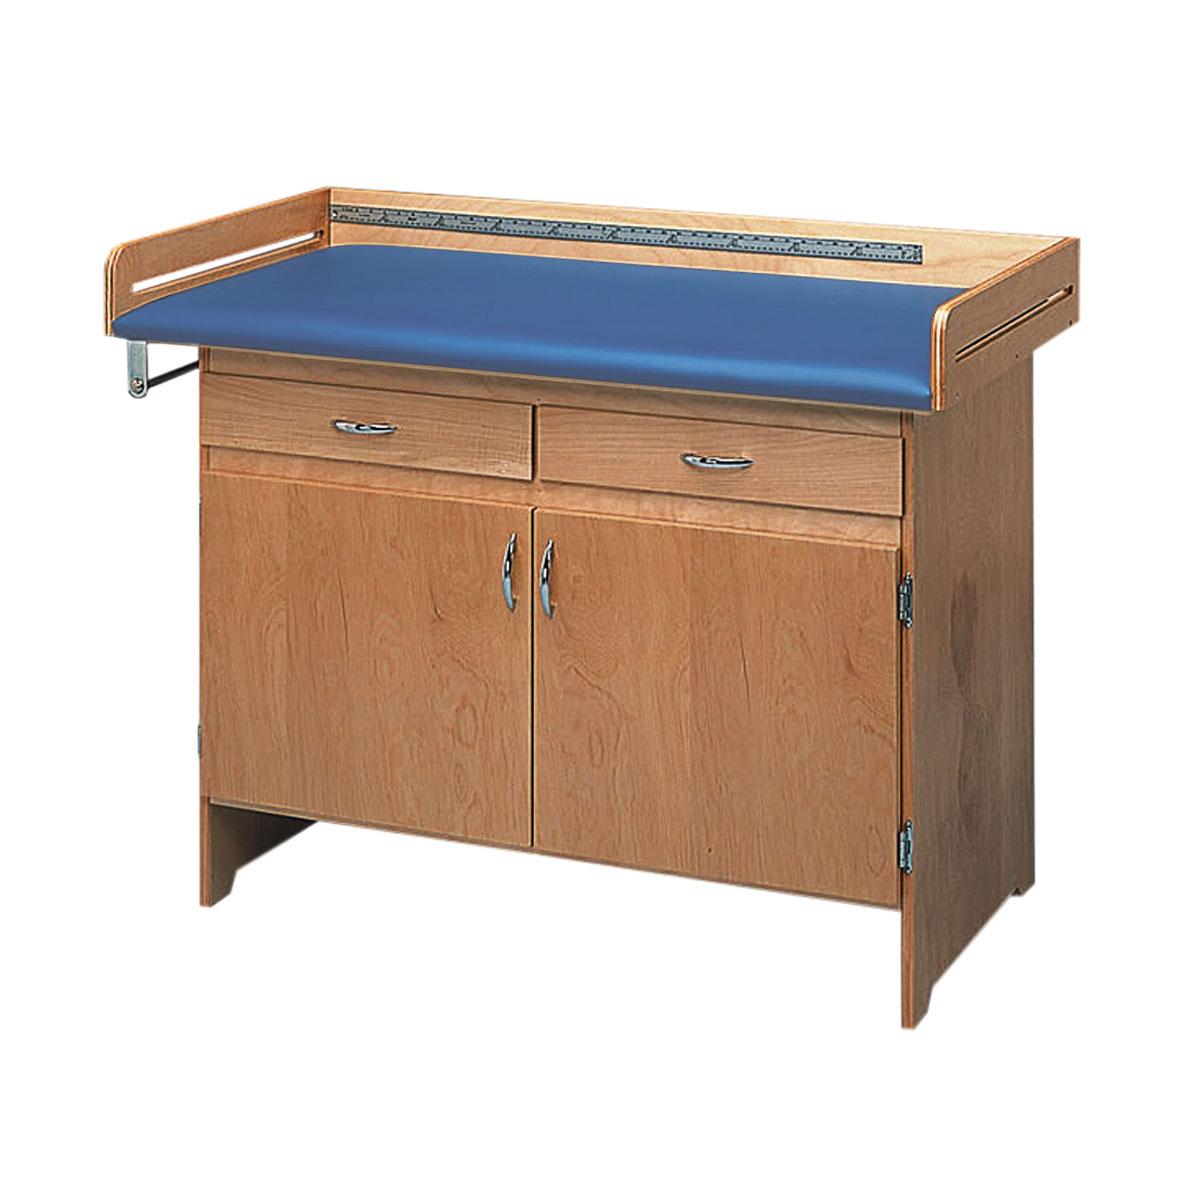 Pediatric Exam Table Space Blue W50851pedsb Bailey